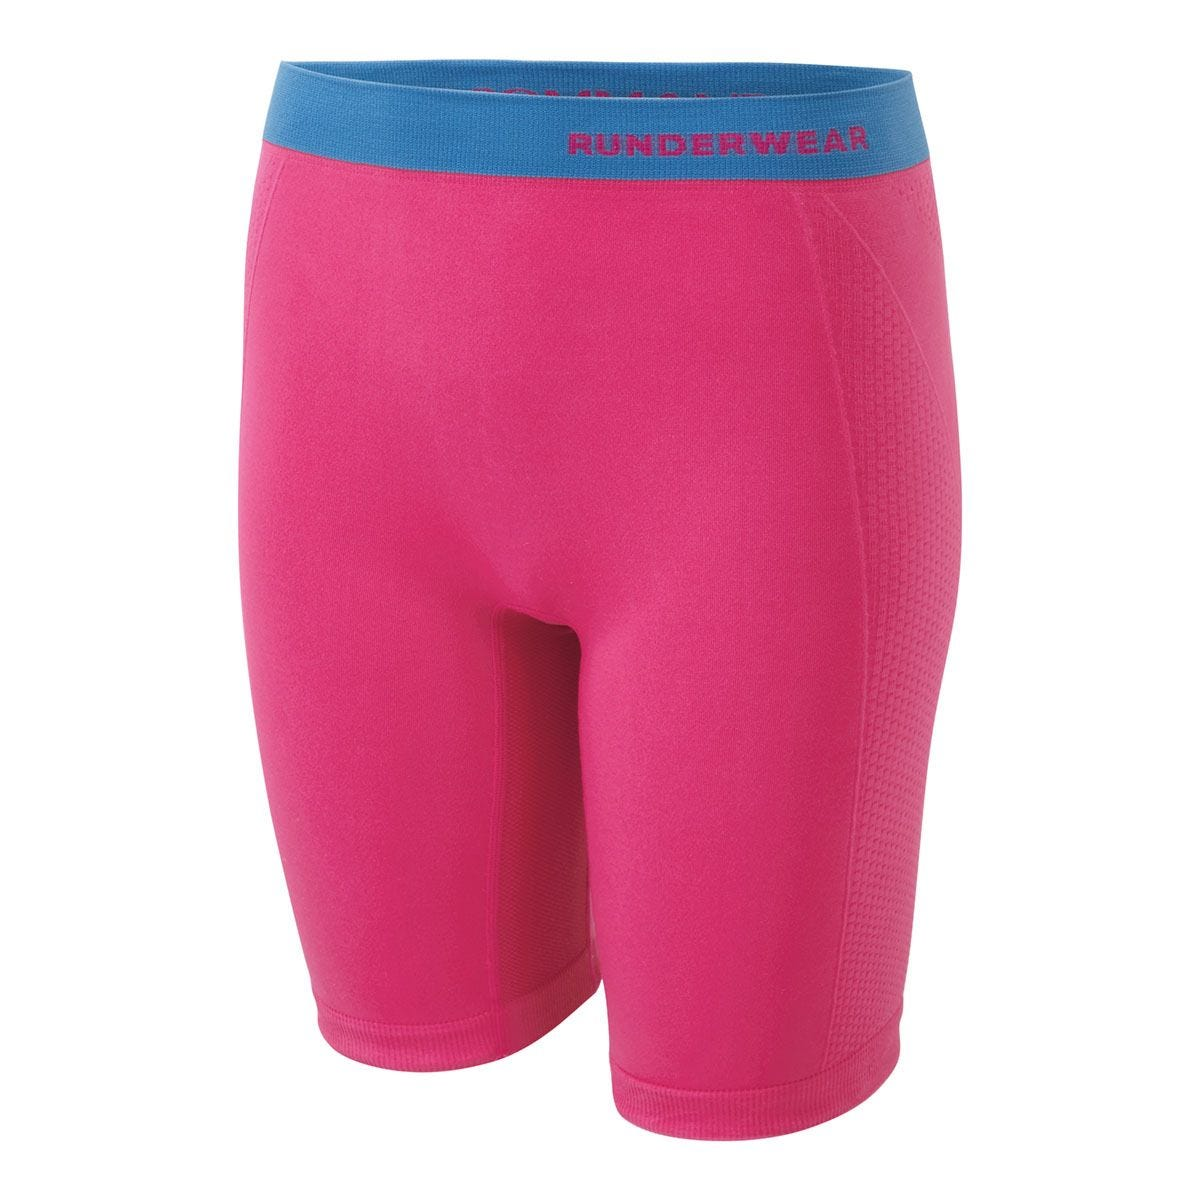 Runderwear Women's Long Shorts - Chafe-Free Extra Extra Large - Pink